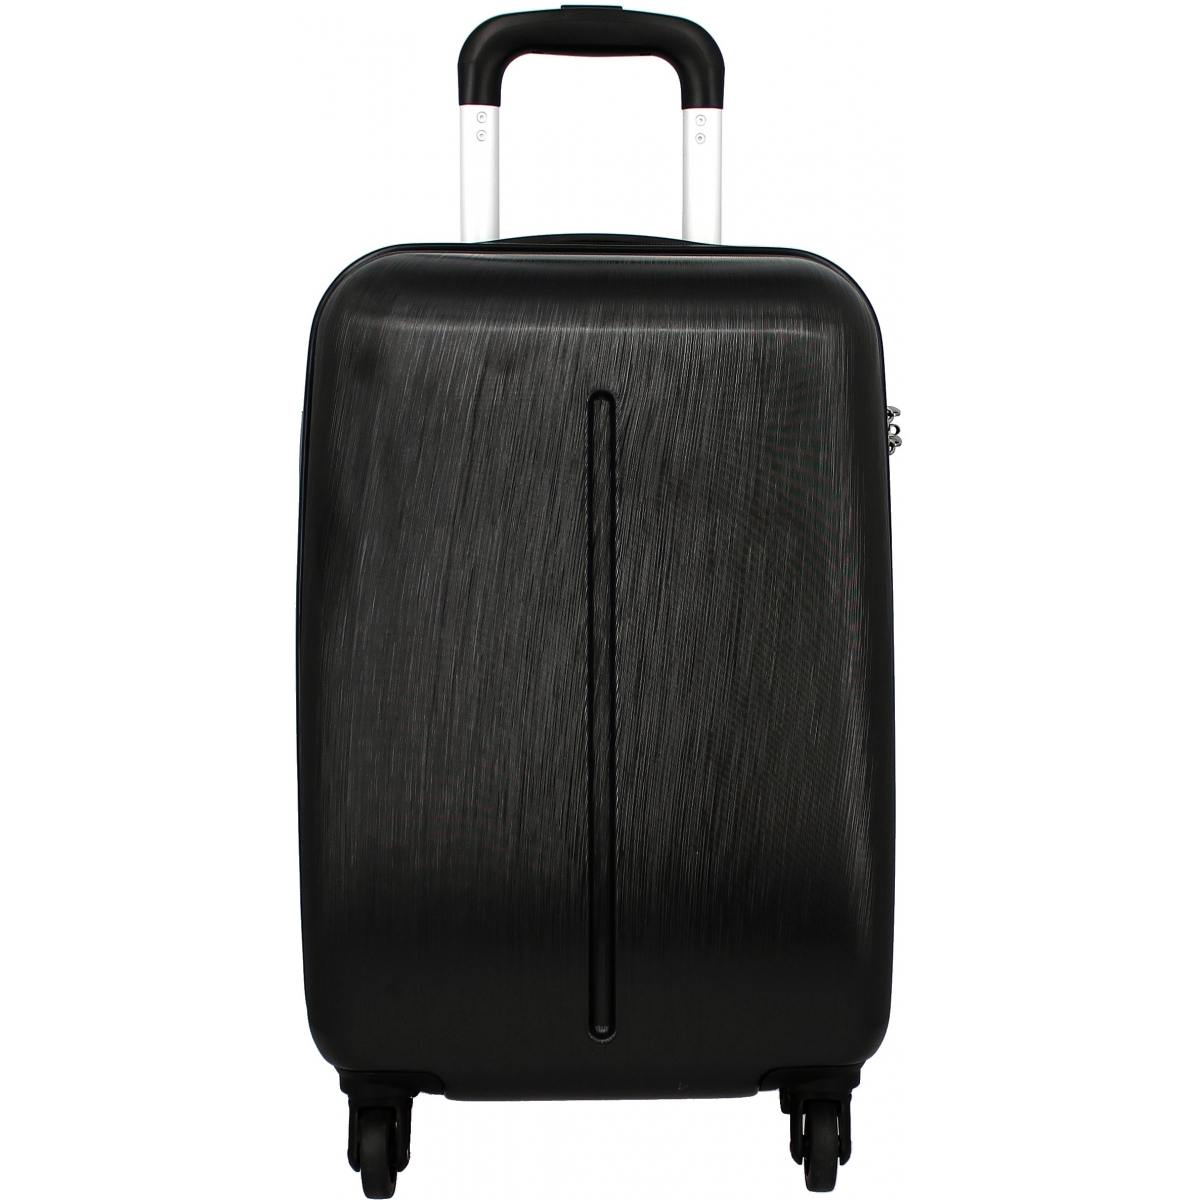 Valise cabine ryanair david jones 54 5 cm tsa ba10141p couleur principale - Valise a prix discount ...